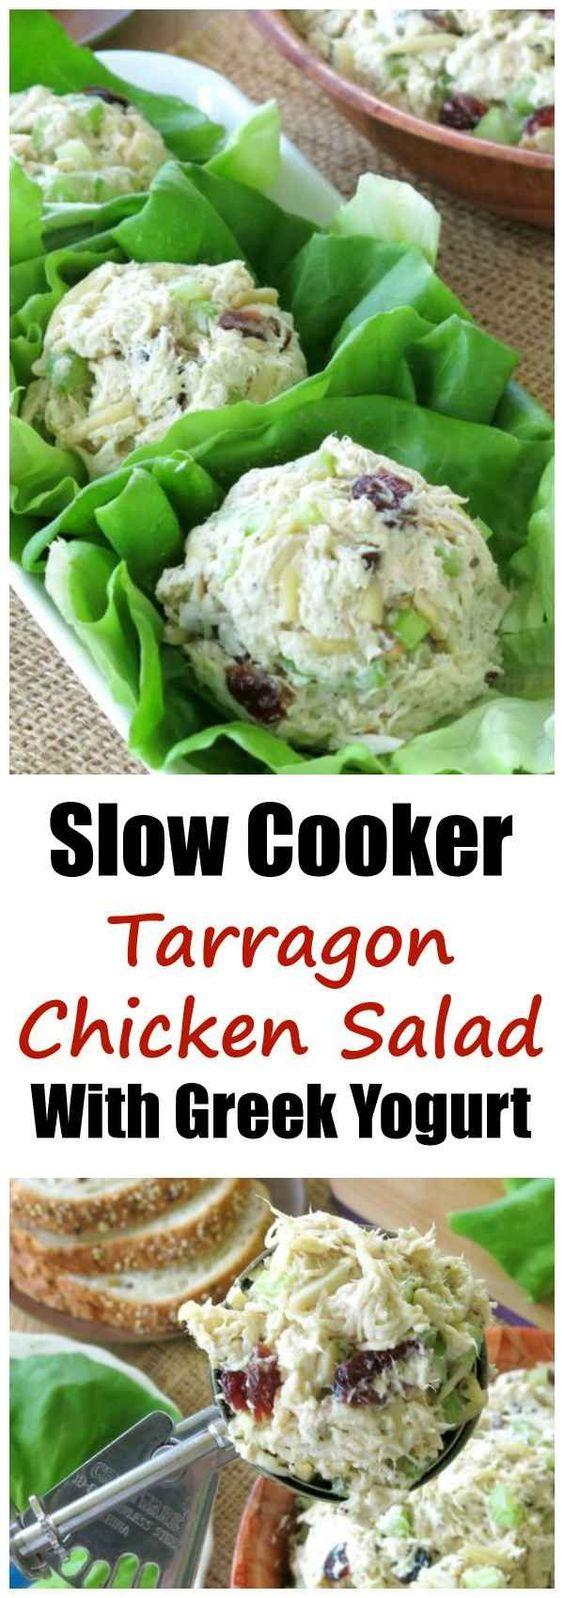 Slow Cooker Tarragon Chicken Salad